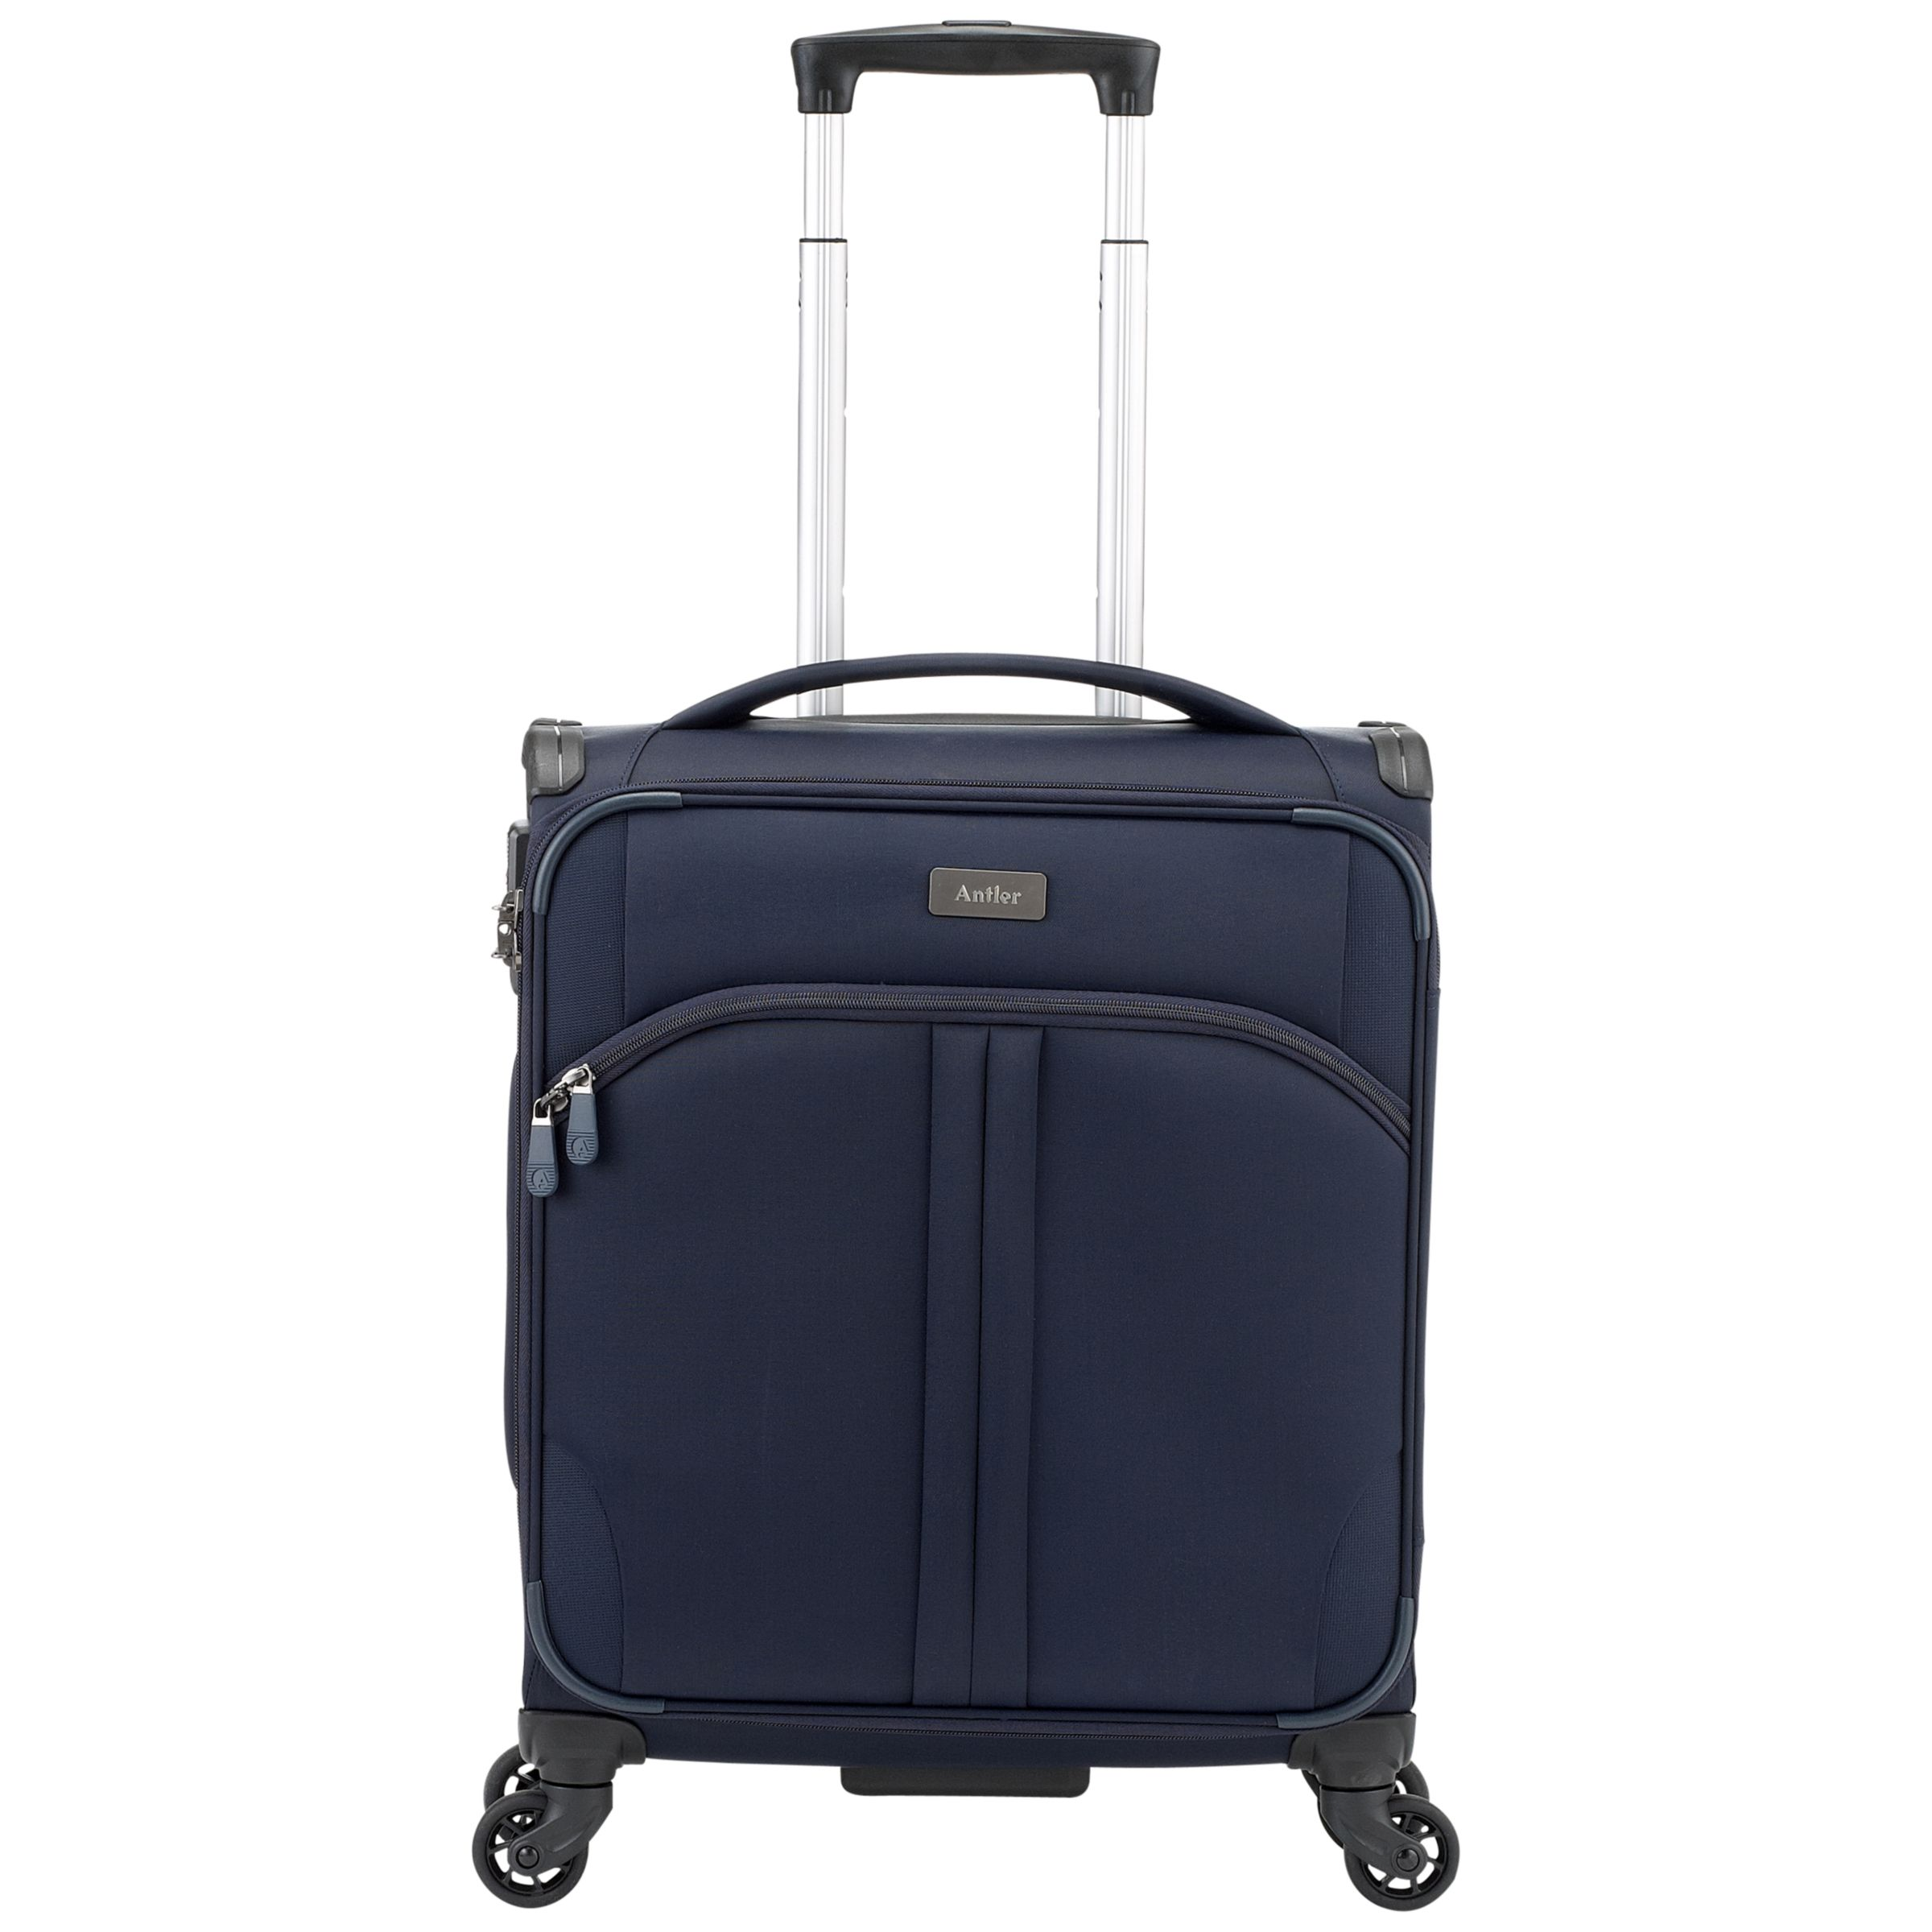 Antler Antler Aire 4-Wheel 55cm C1 Cabin Suitcase